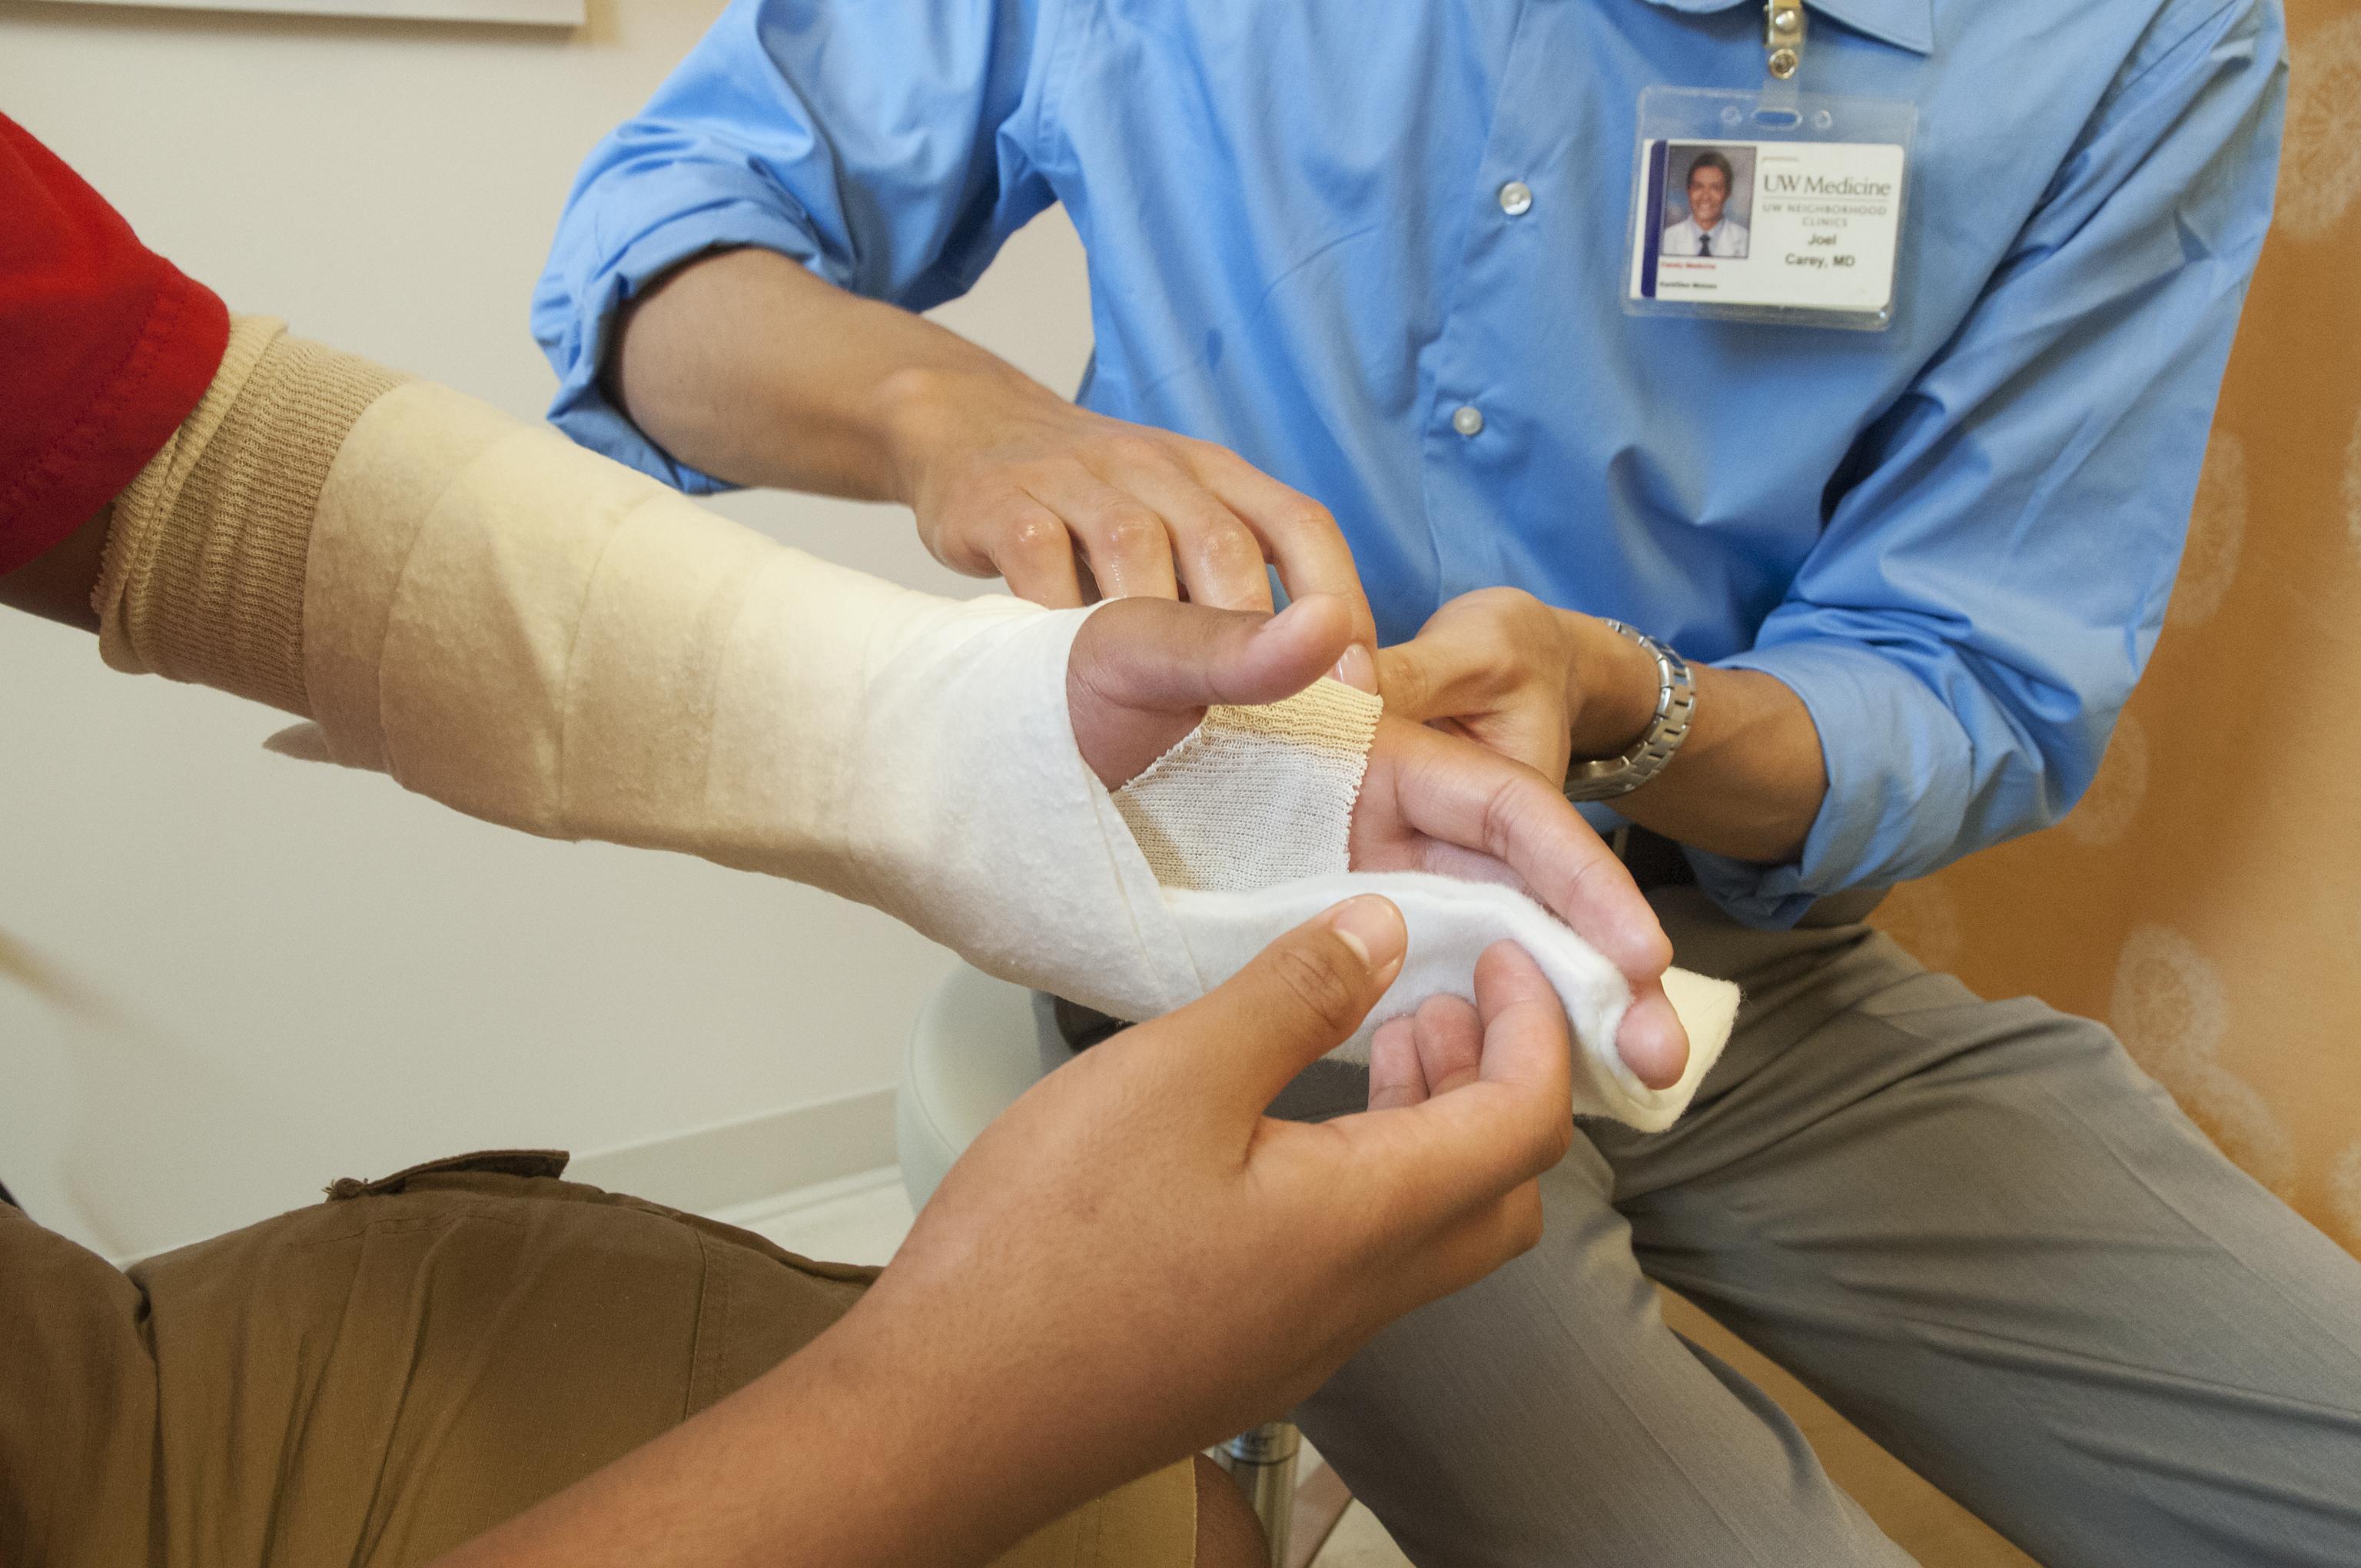 Dr. Joel Carey, family medicine, applies a splint to a patient's broken wrist at the UW Neighborhood Kent/Des Moines Clinic.